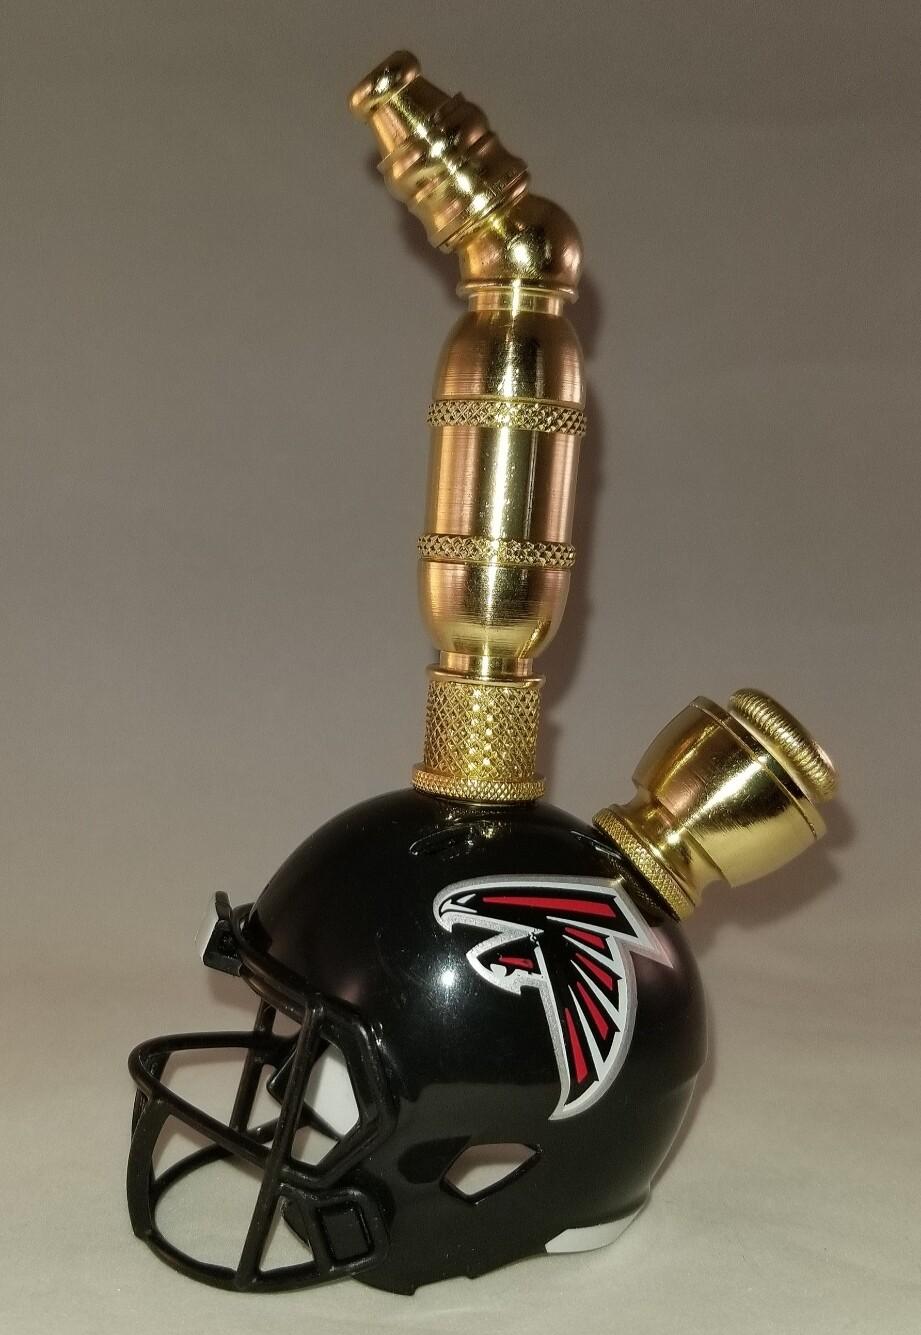 ATLANTA FALCONS NFL FOOTBALL HELMET SMOKING PIPE Upright/Brass